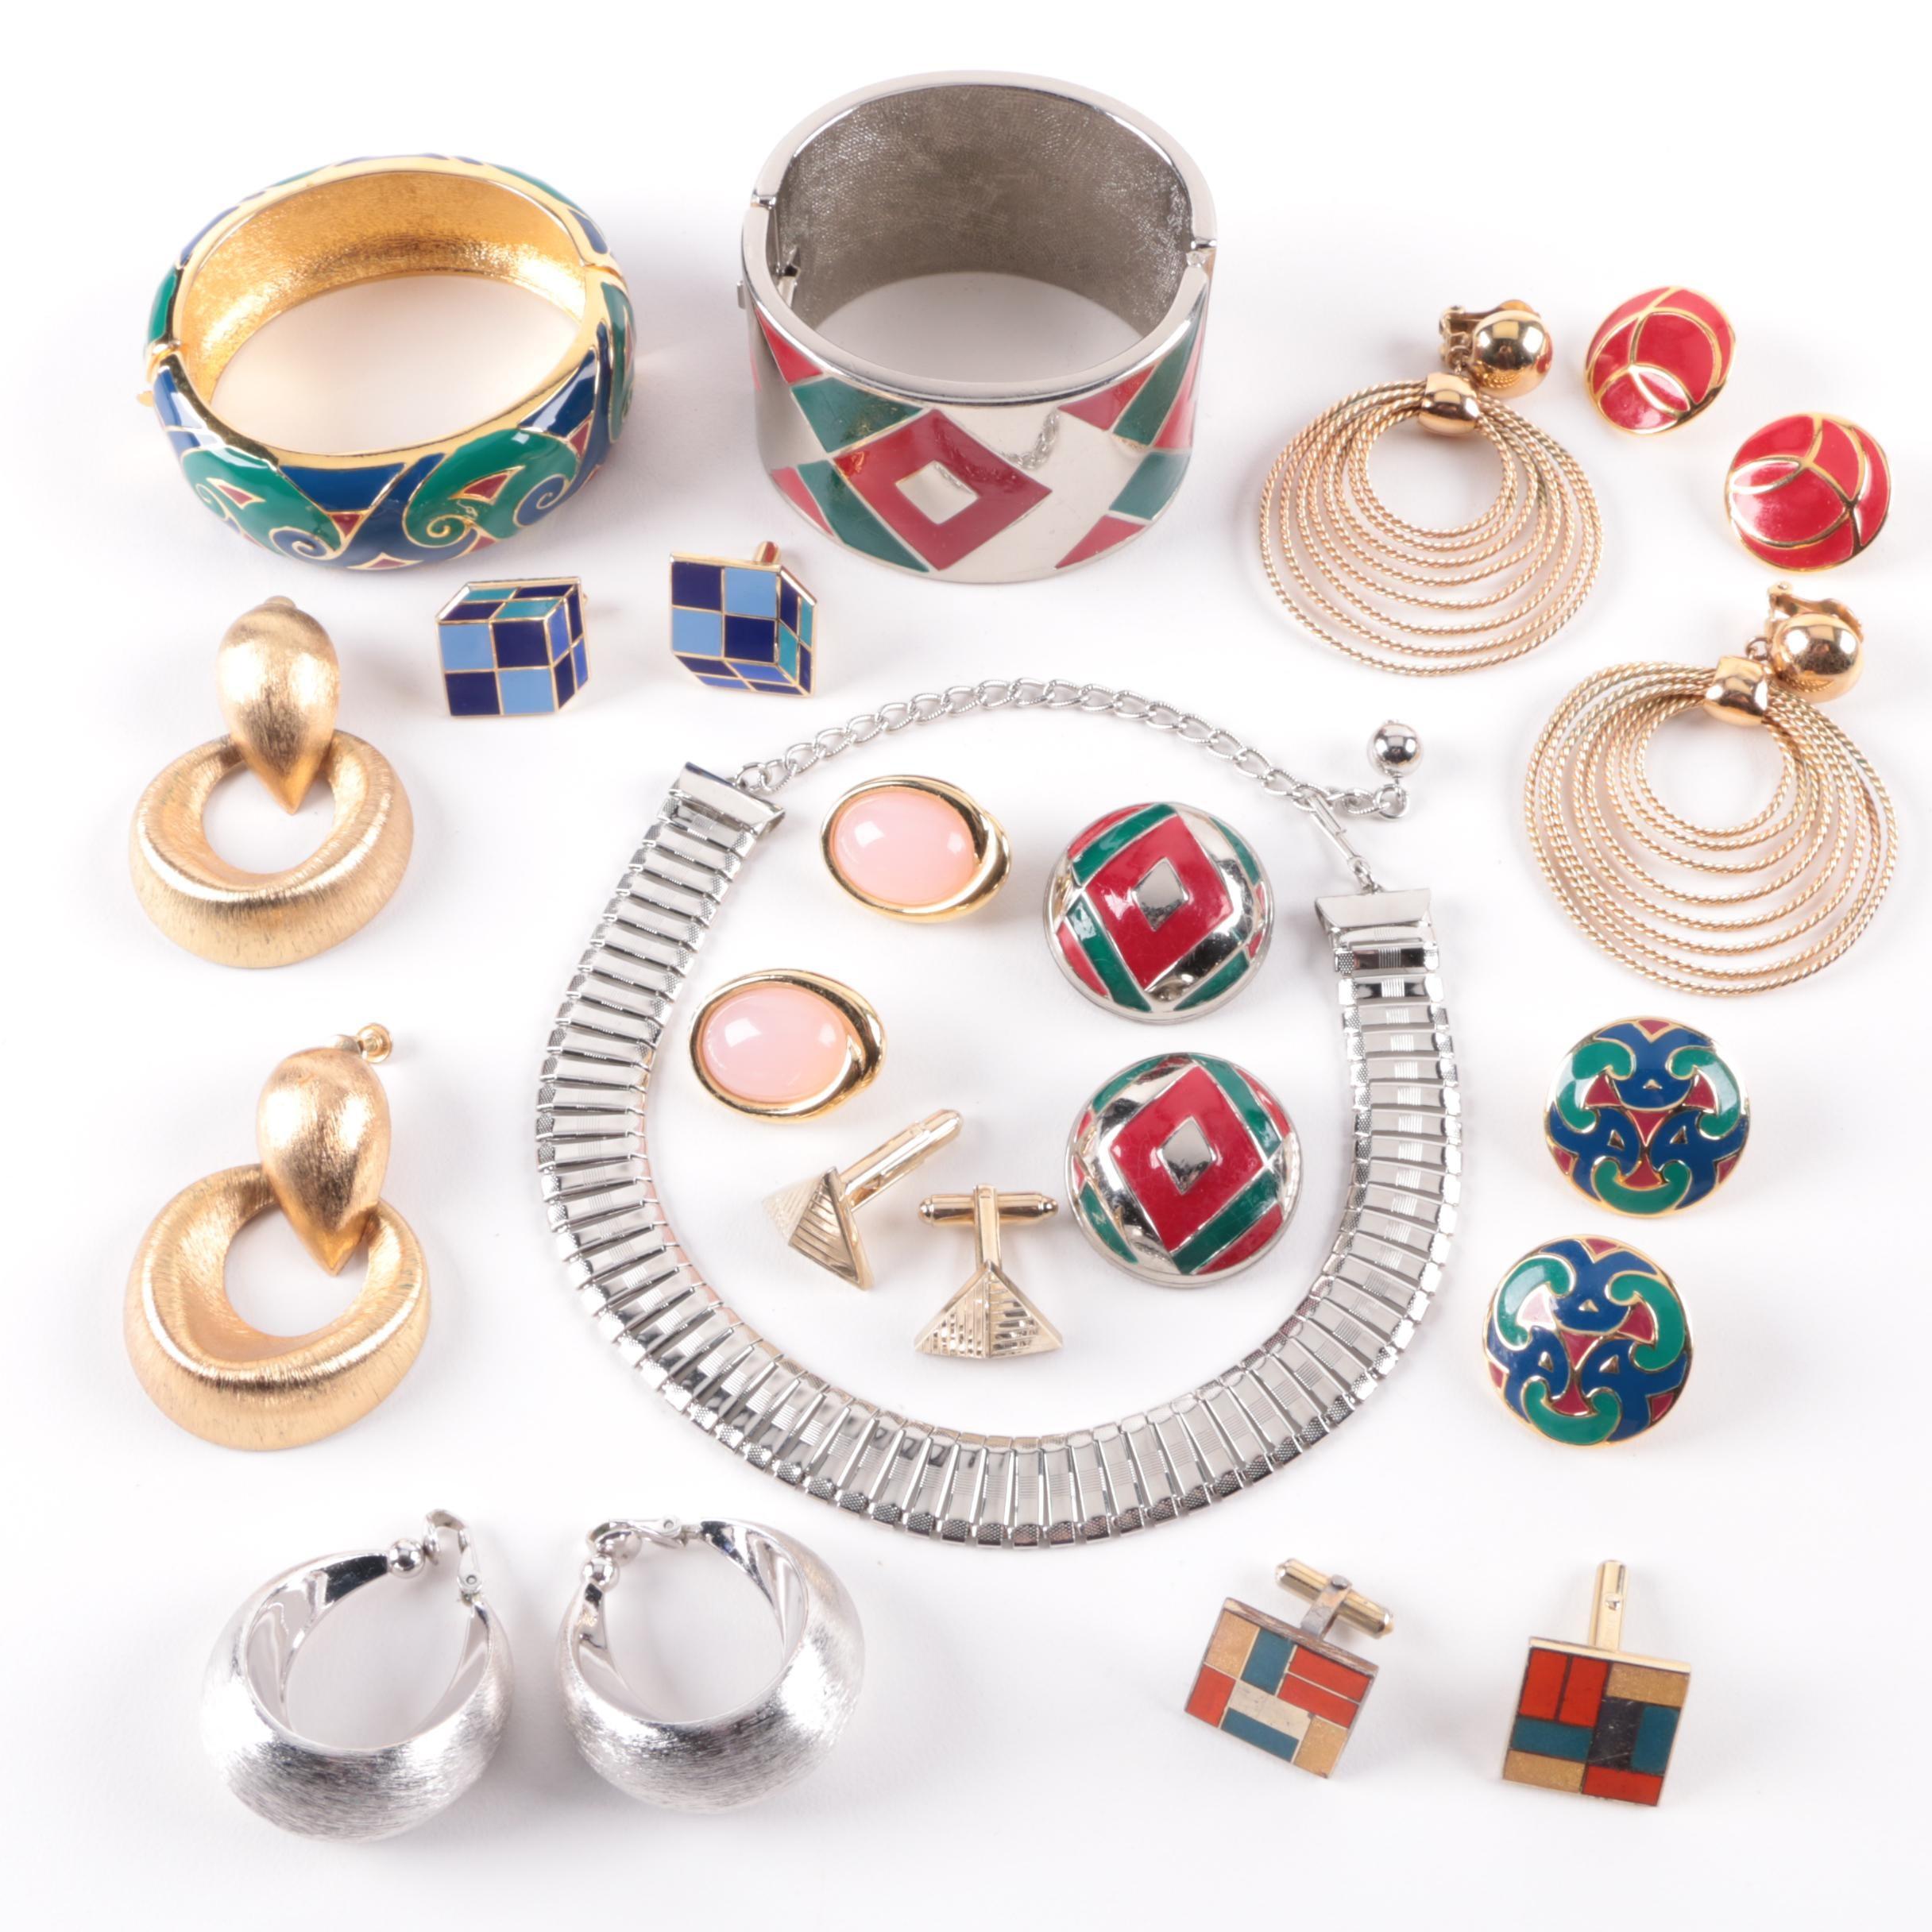 Trifari, Napier, and Lanvin Paris Enamel Jewelry Selection